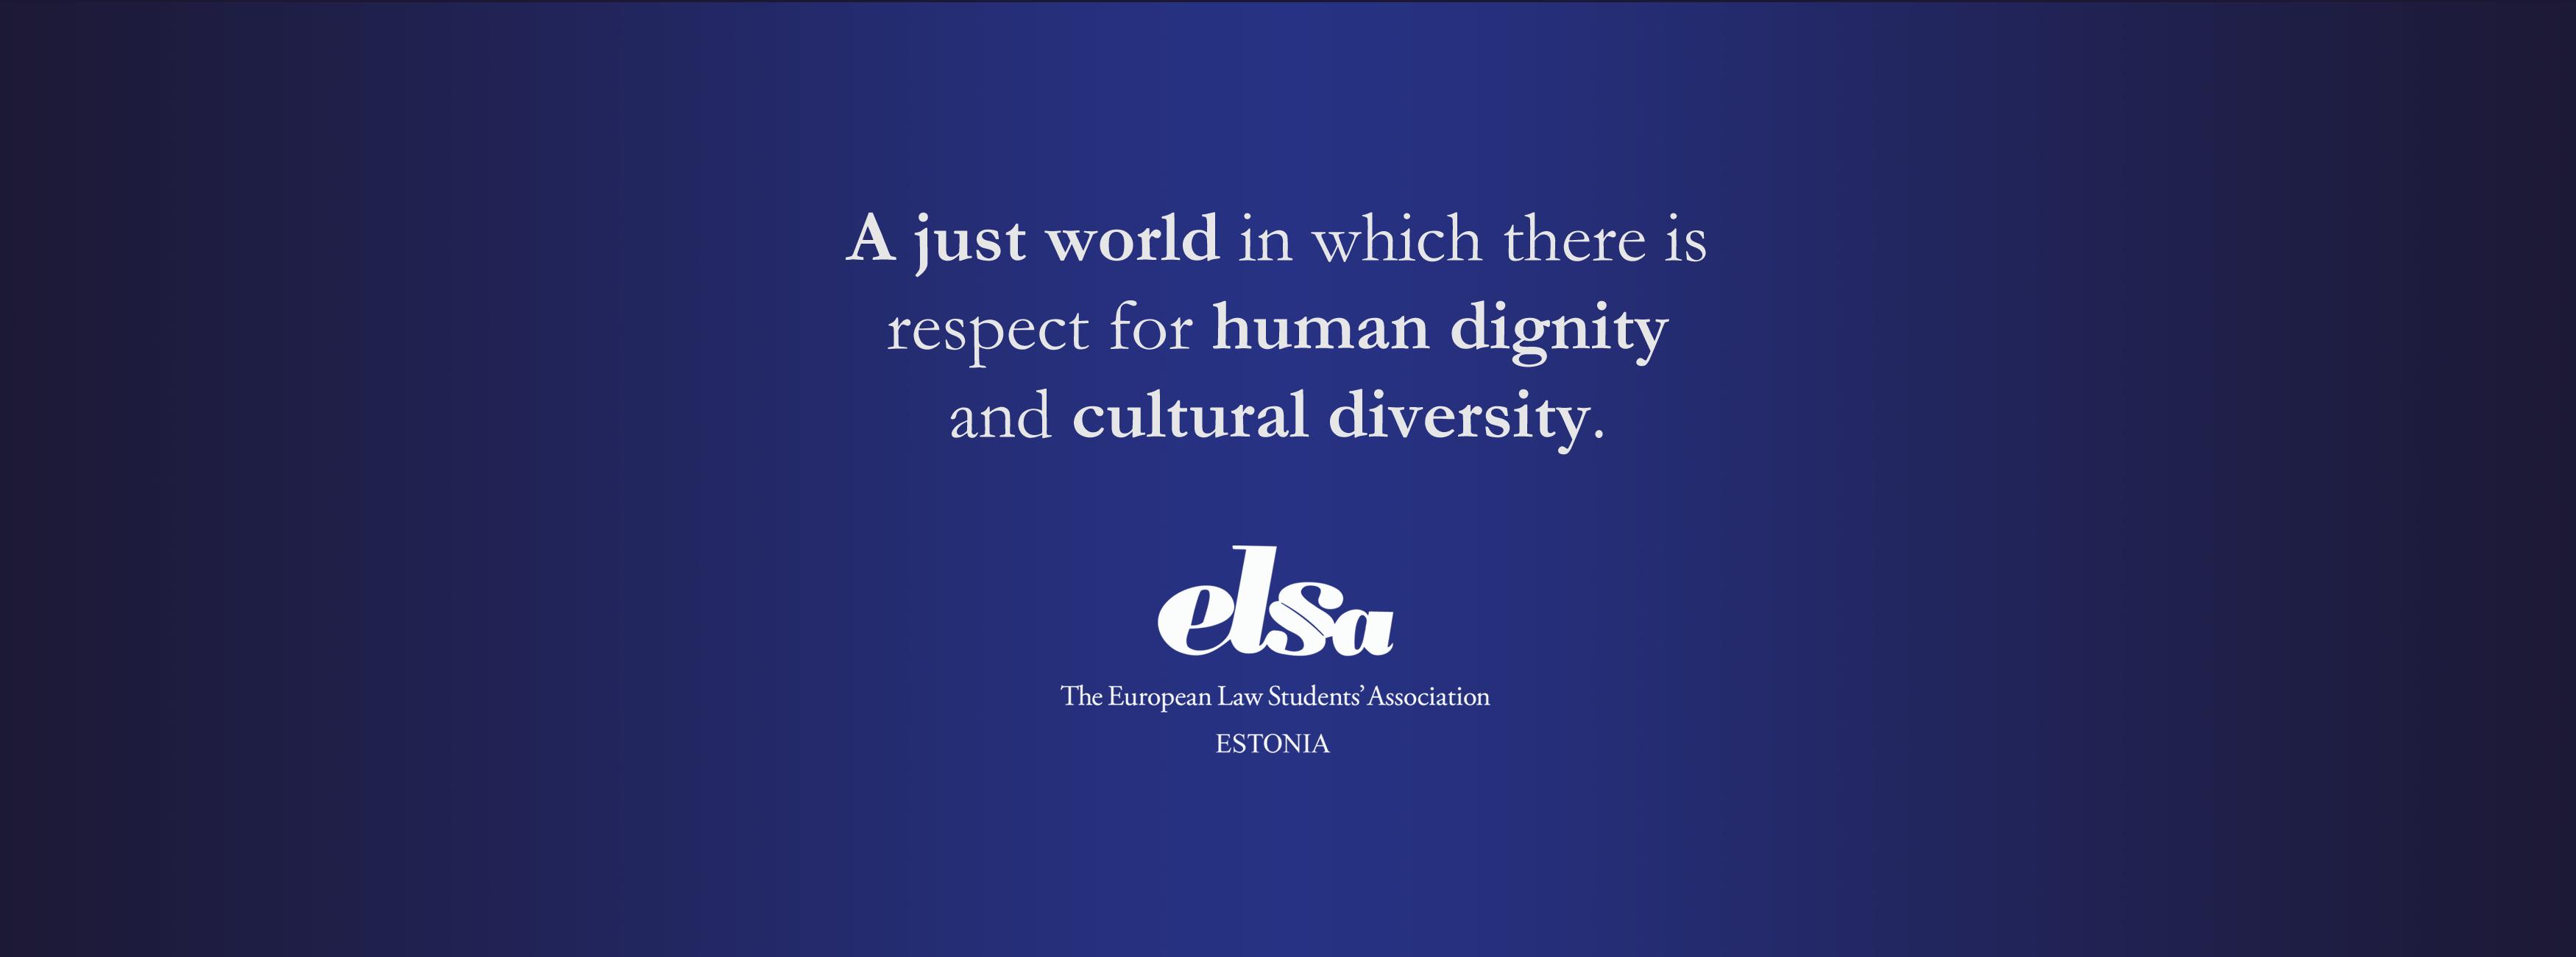 Just_world_ELSA_wide